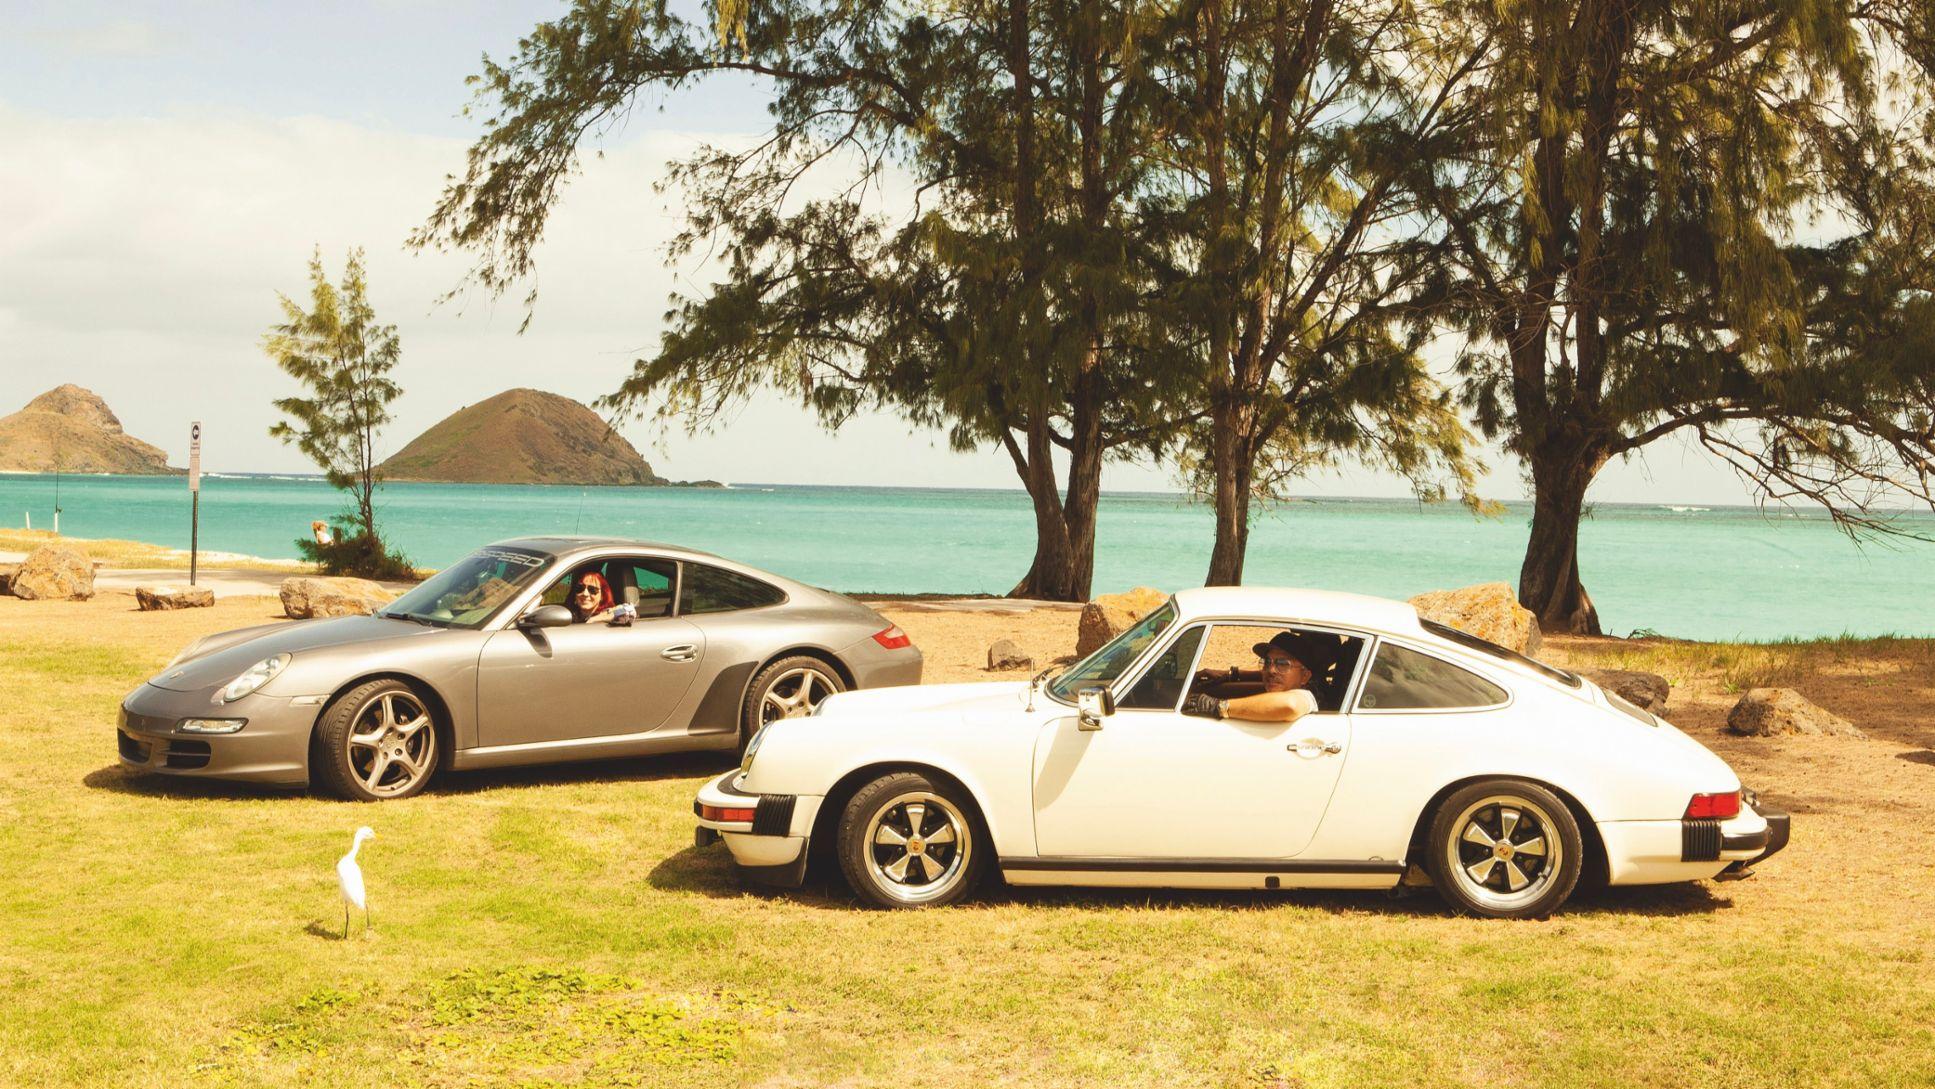 Porsche in Paradise - Image 8